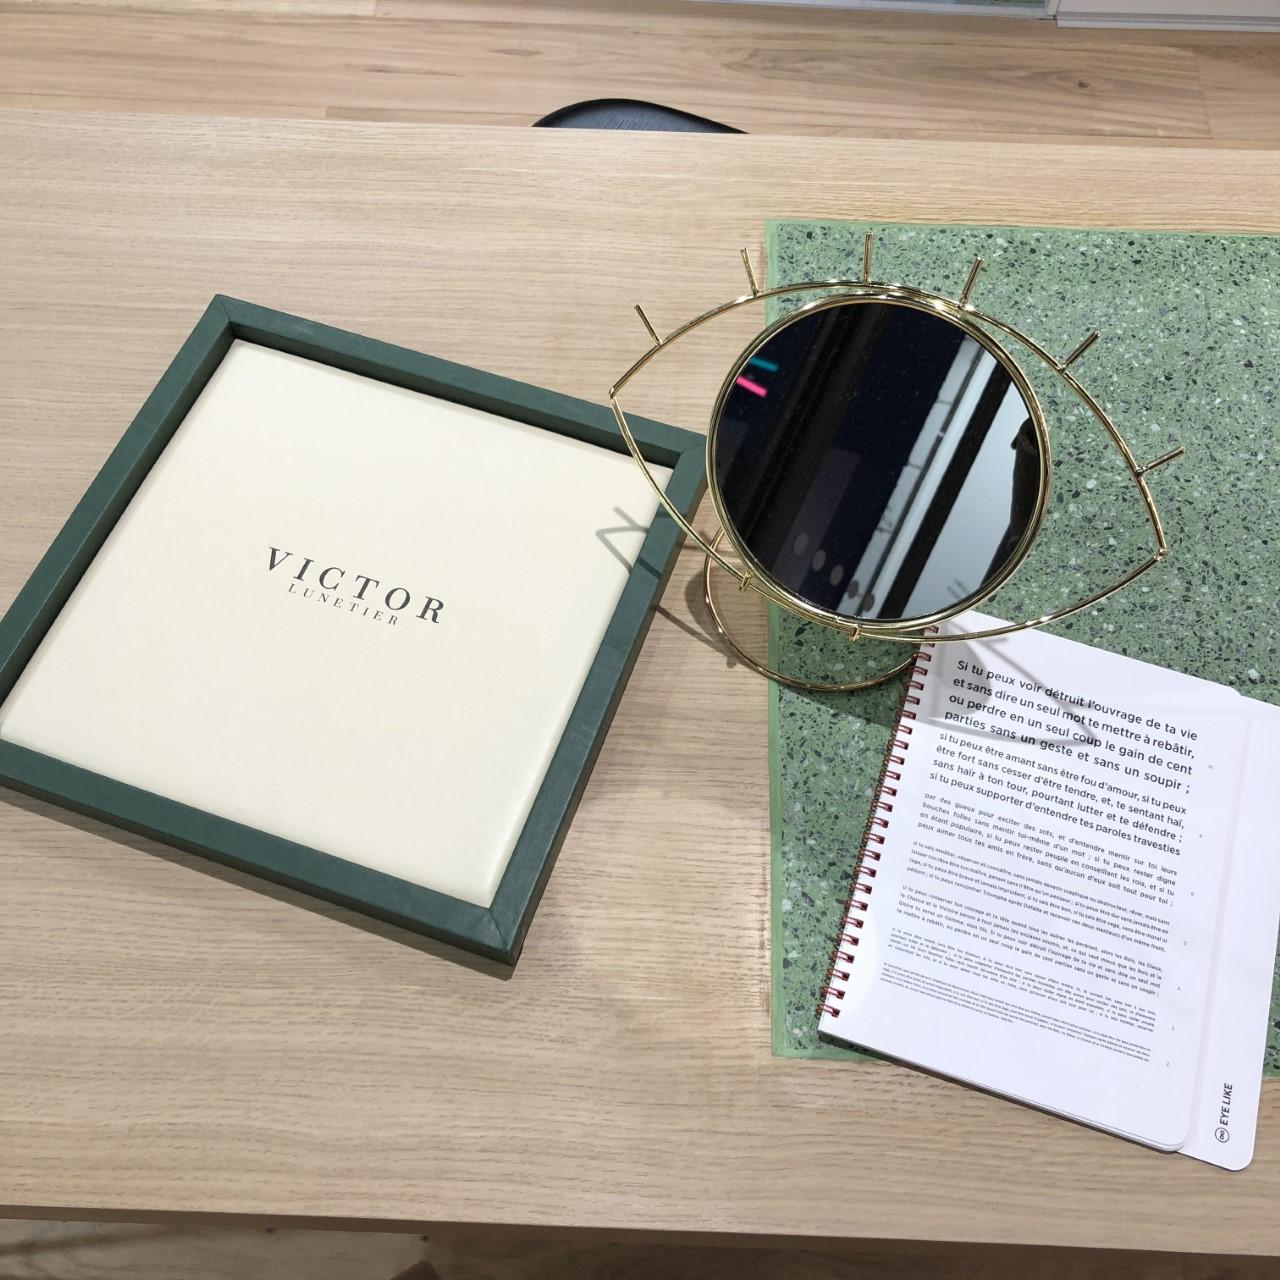 victor lunetier blog lifestyle avignon